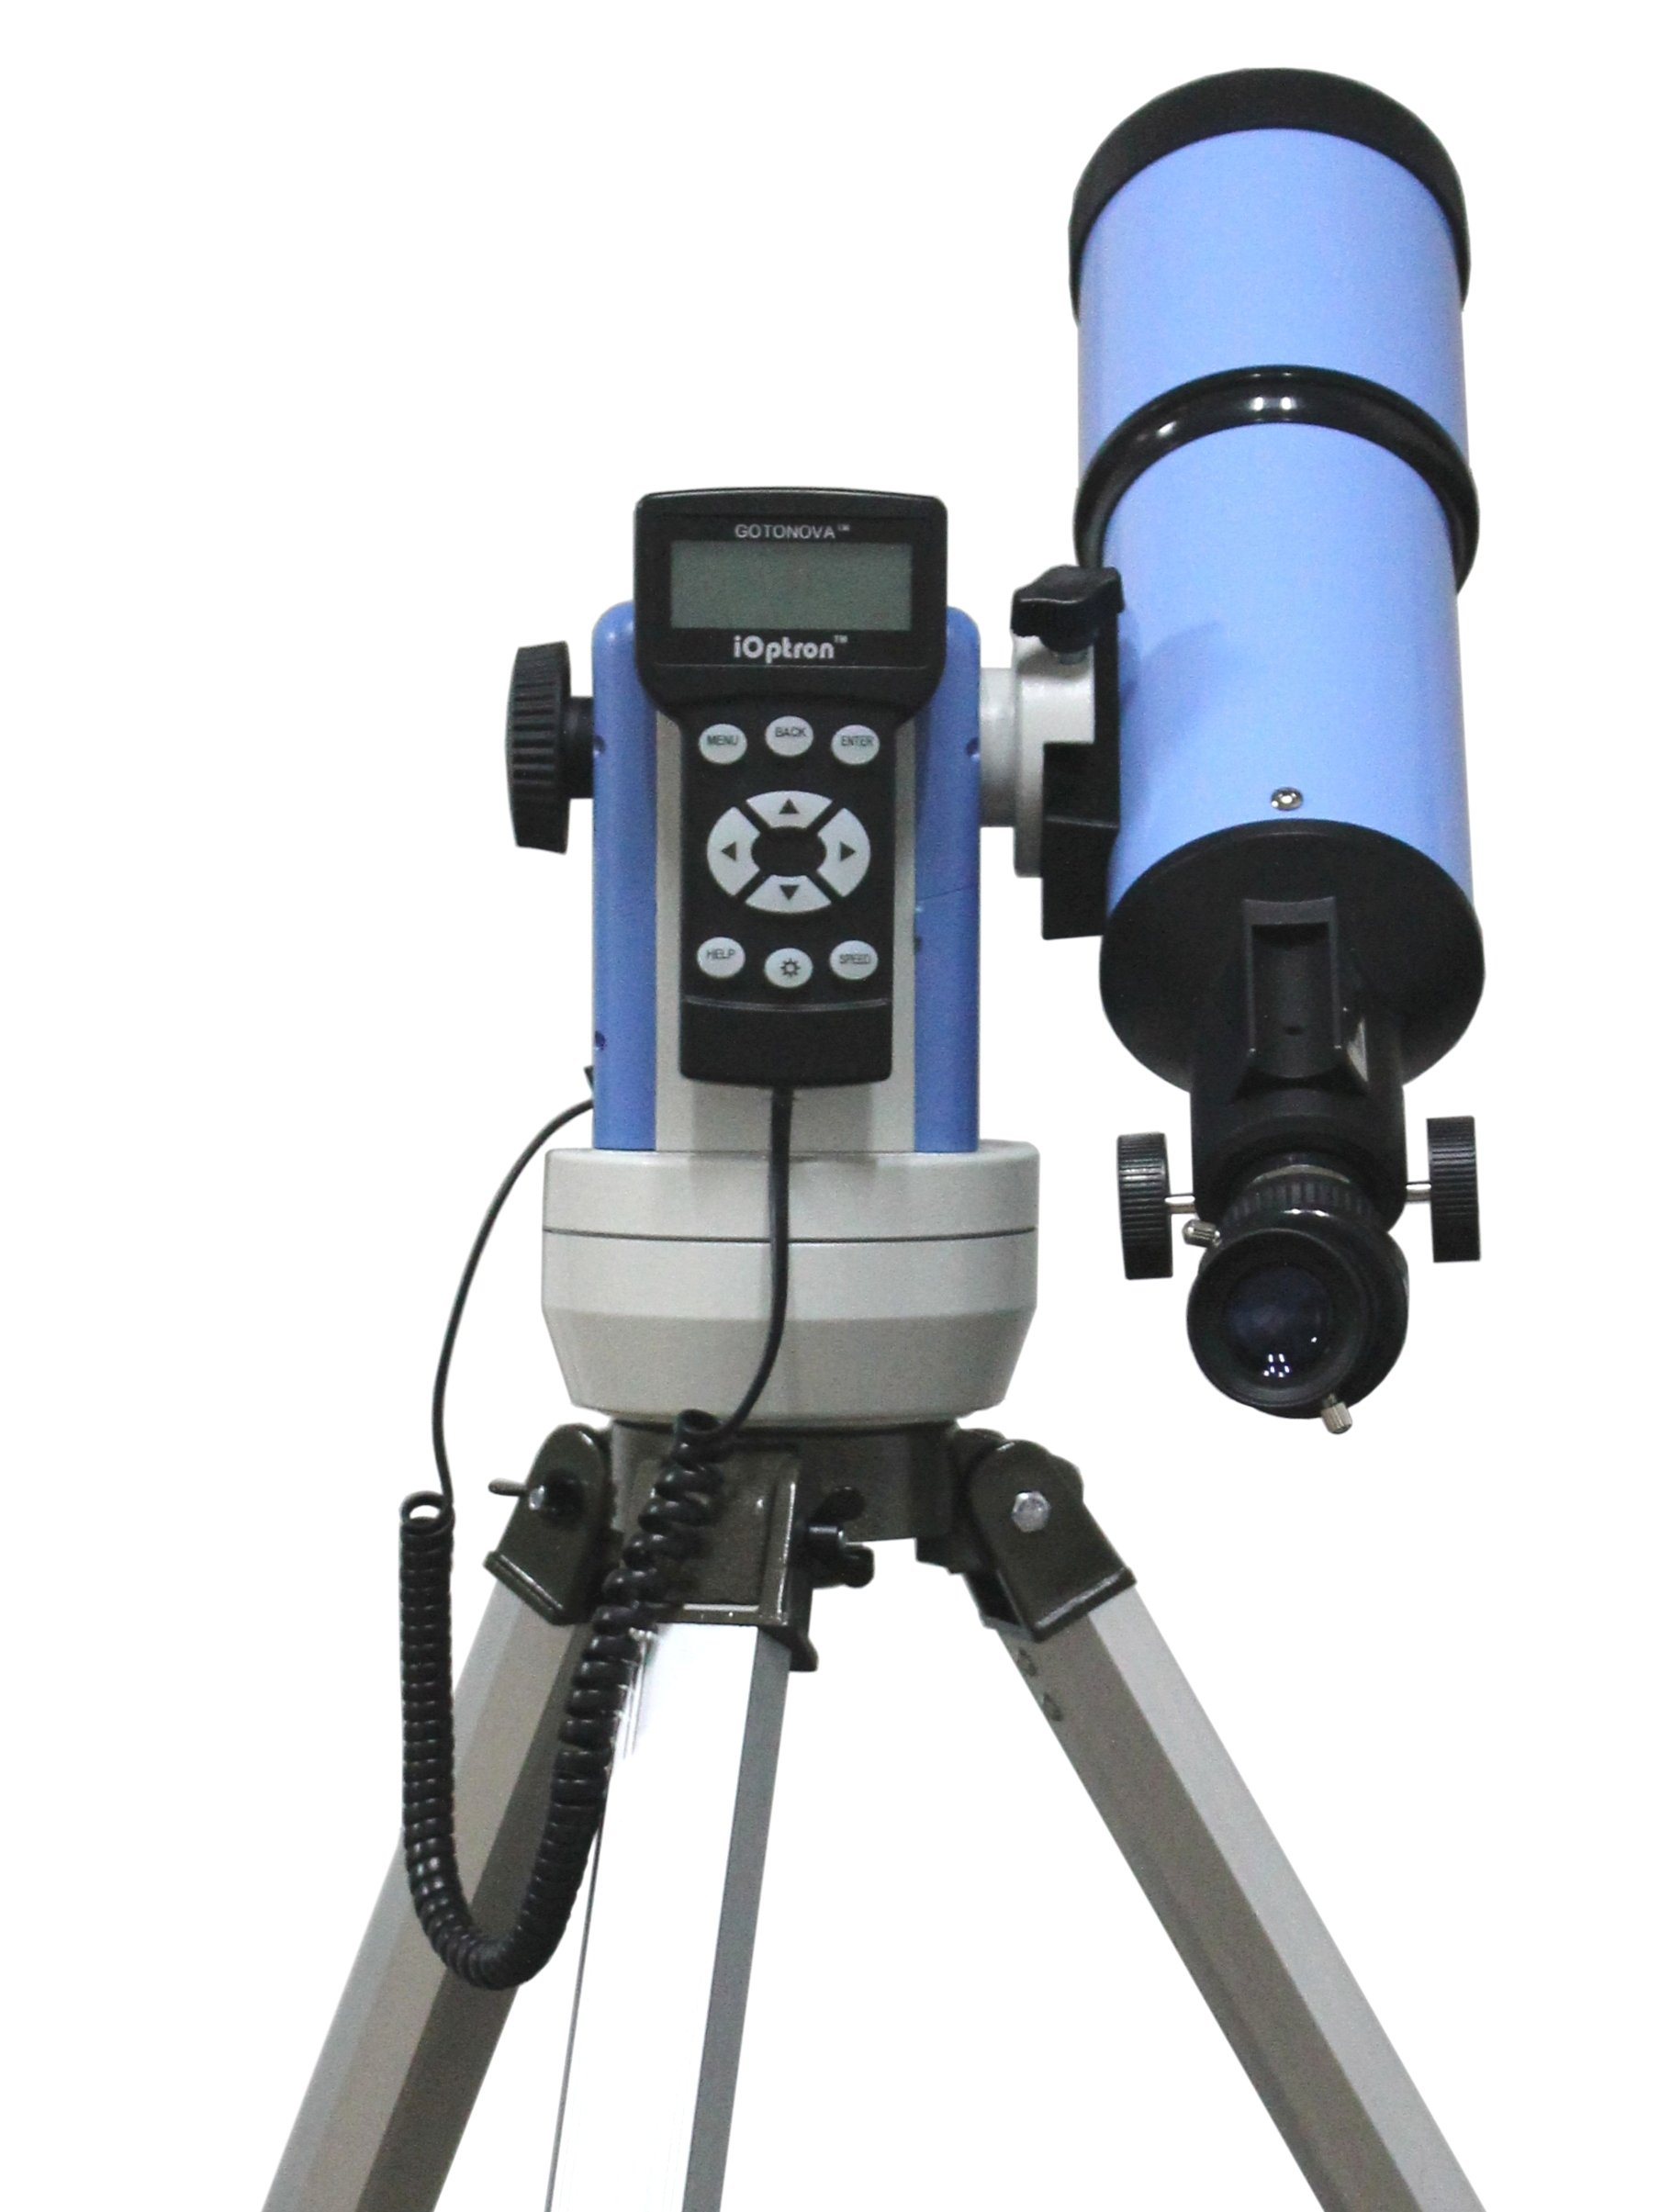 iOptron 9802 SmartStar-R80 GPS Telescope (Blue) by iOptron